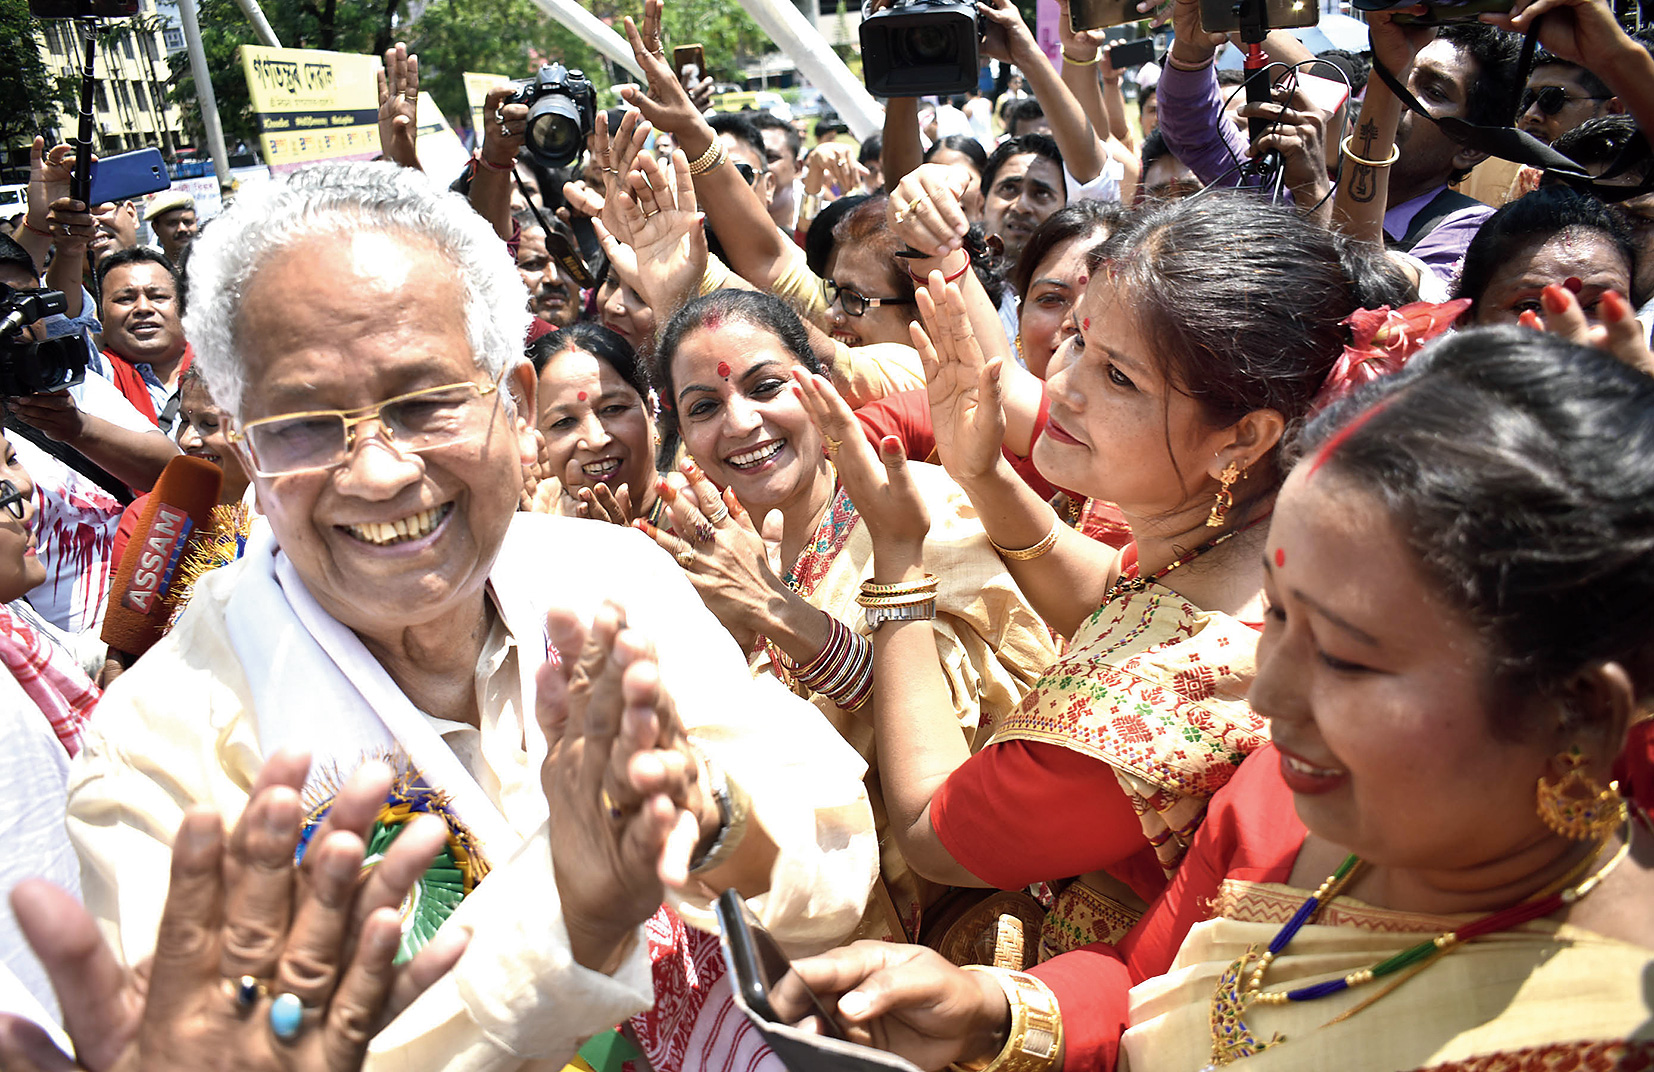 Former chief minister and veteran Congress leader Tarun Gogoi participates in the celebrations.